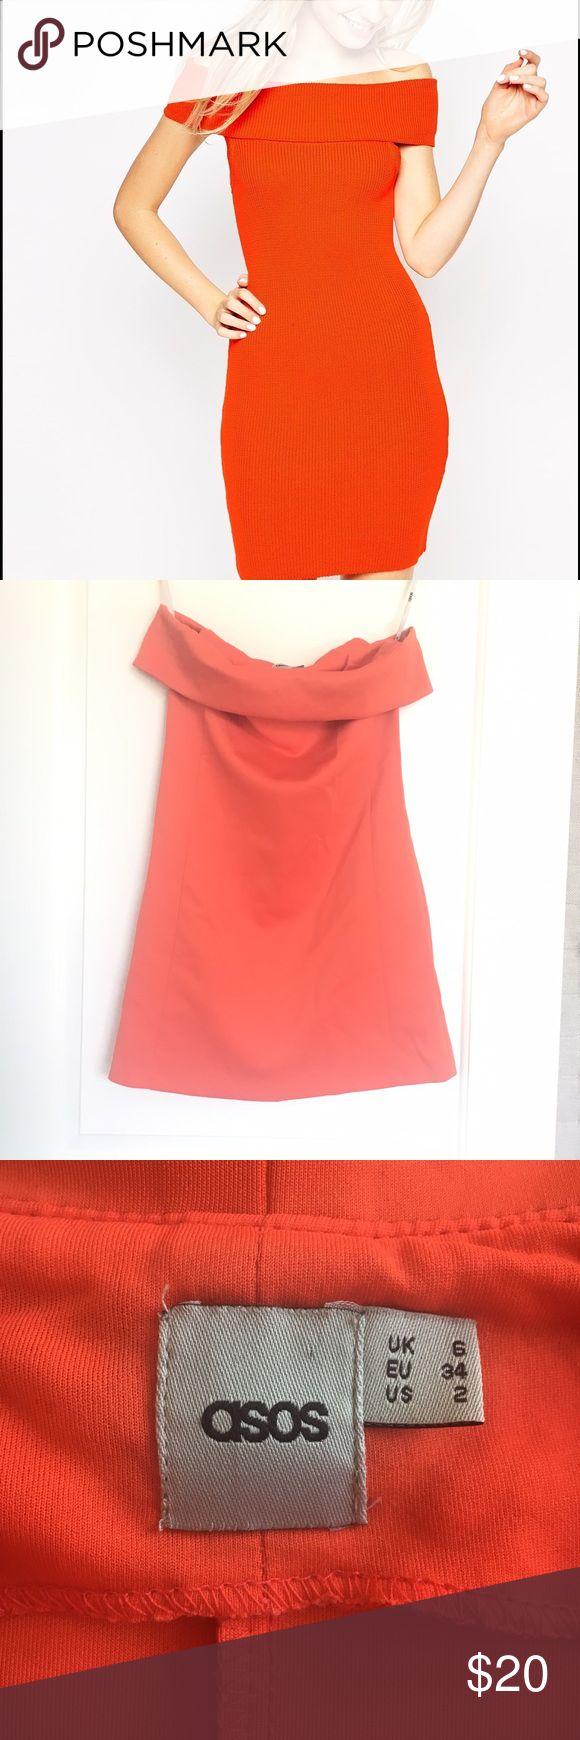 🎉ON SALES🎉 ASOS ORANGE OFF SHOULDER DRESS ASOS Off-shoulder orange dress 👗 💋perfect for GNO,spring or summer outfit, vacay dress ASOS Dresses Mini